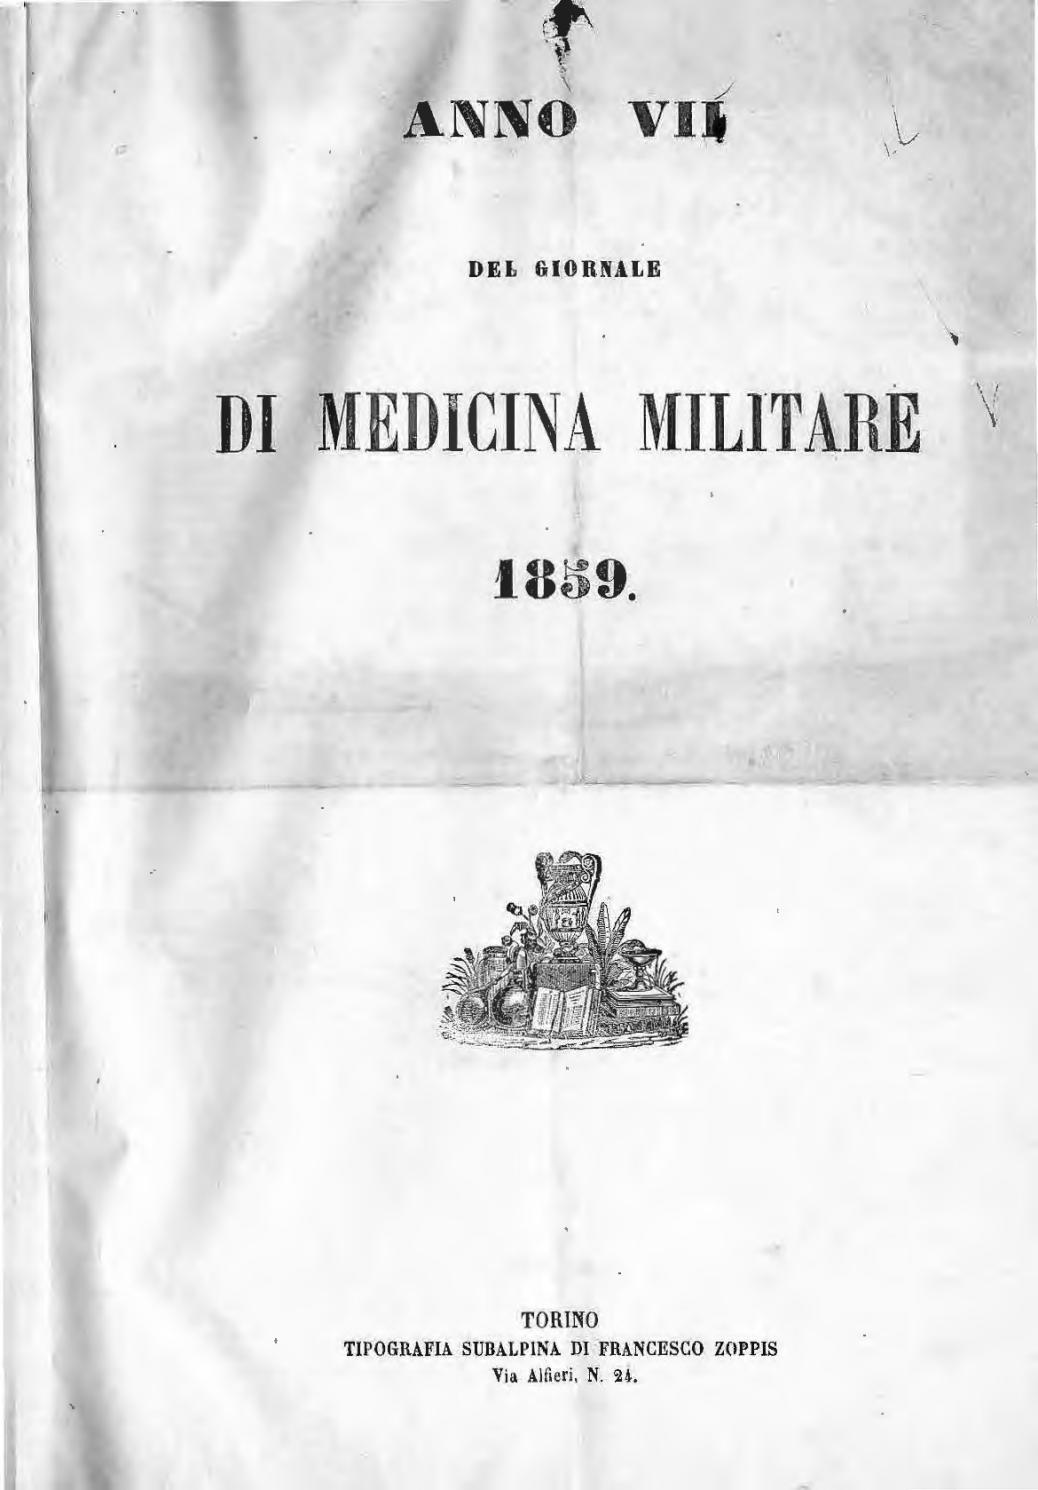 uretrite negli uomini in soldati lyrics download